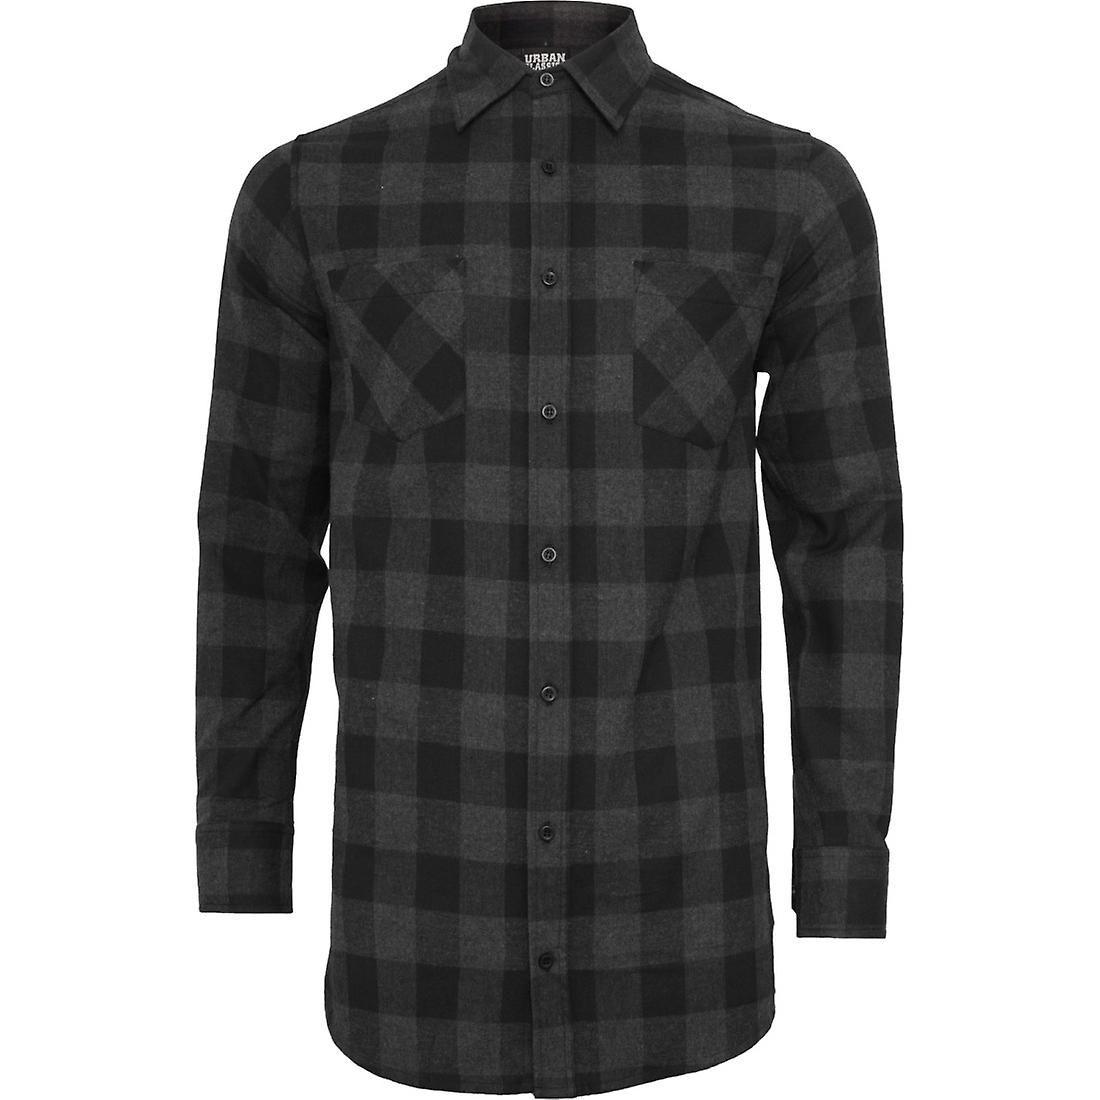 Flannel shirt ideas  Urban classics  LONG FLANNEL shirt black  charcoal  Christmas